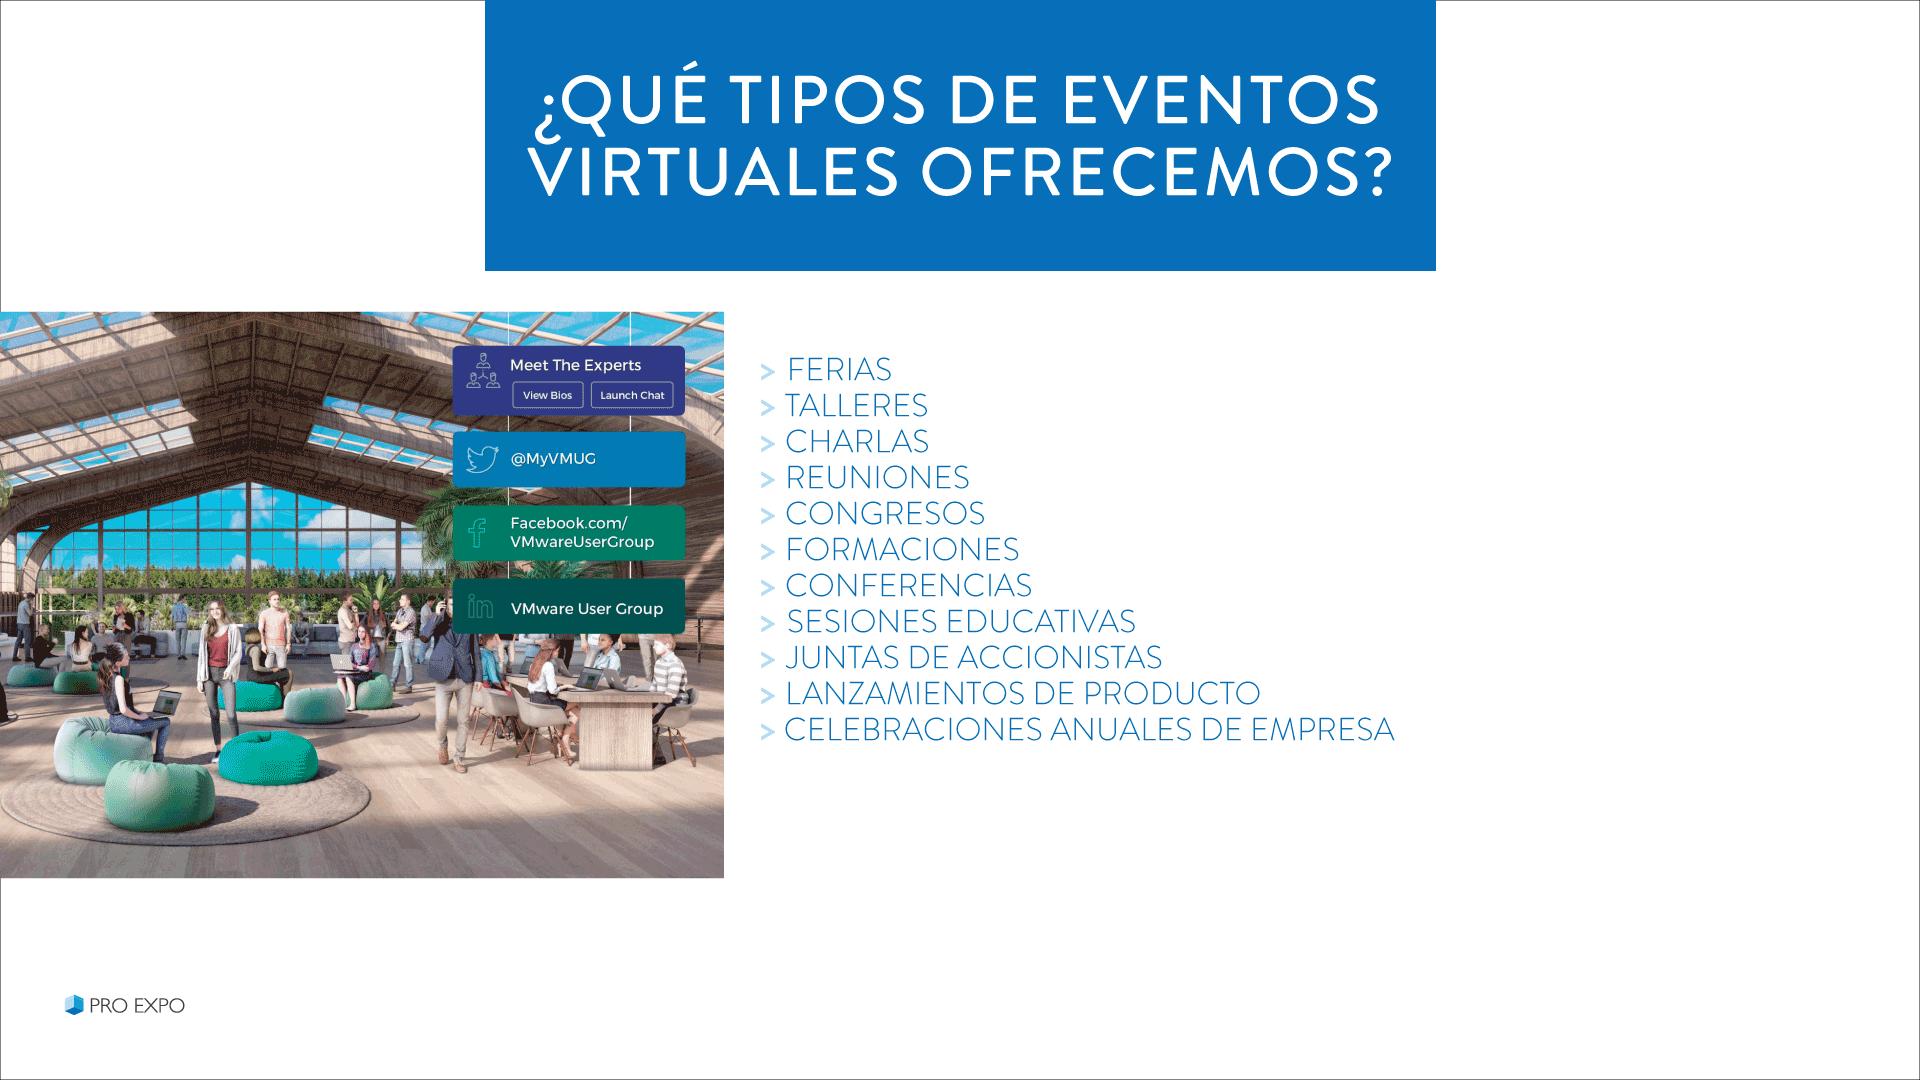 Eventos Virtuales para empresas